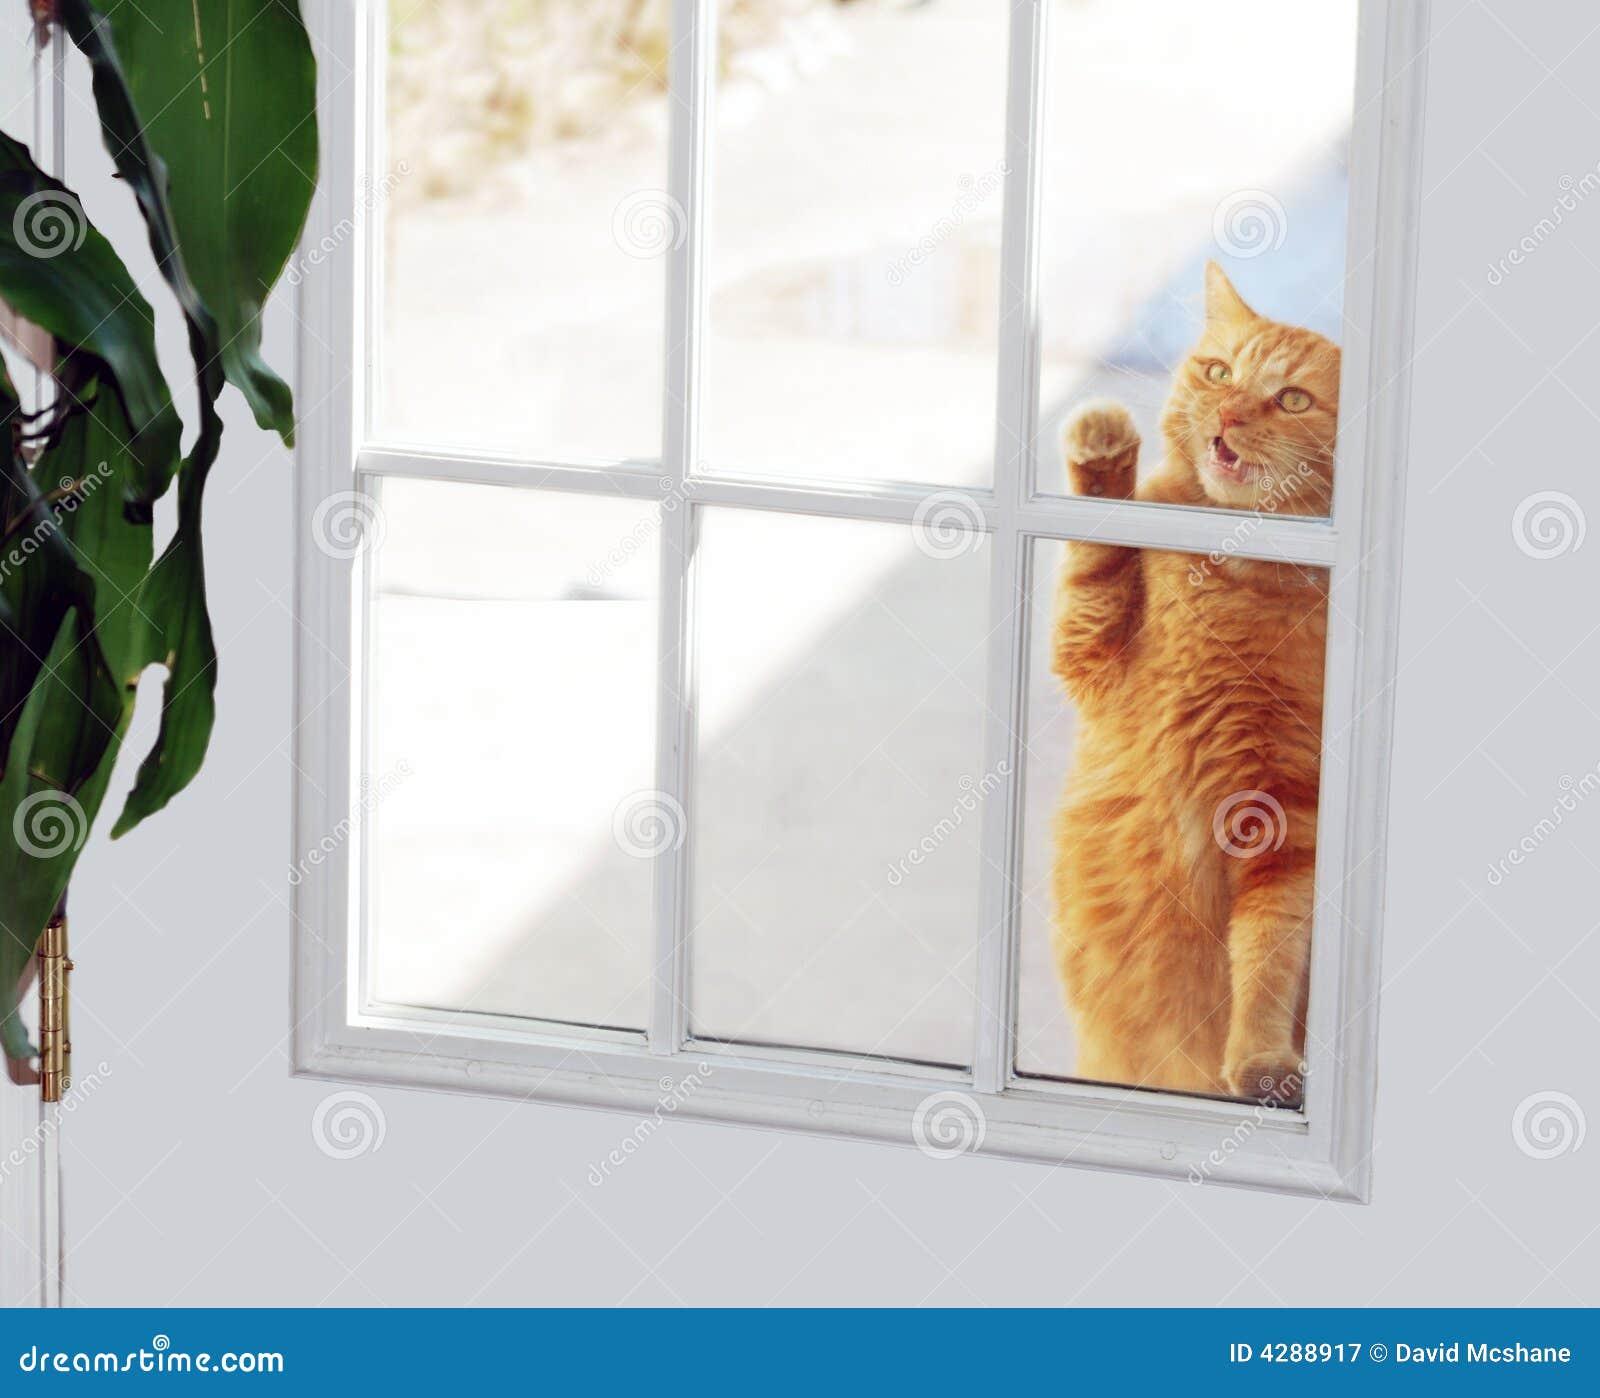 Cat Knocking On Door : Cat knocker royalty free stock photography image